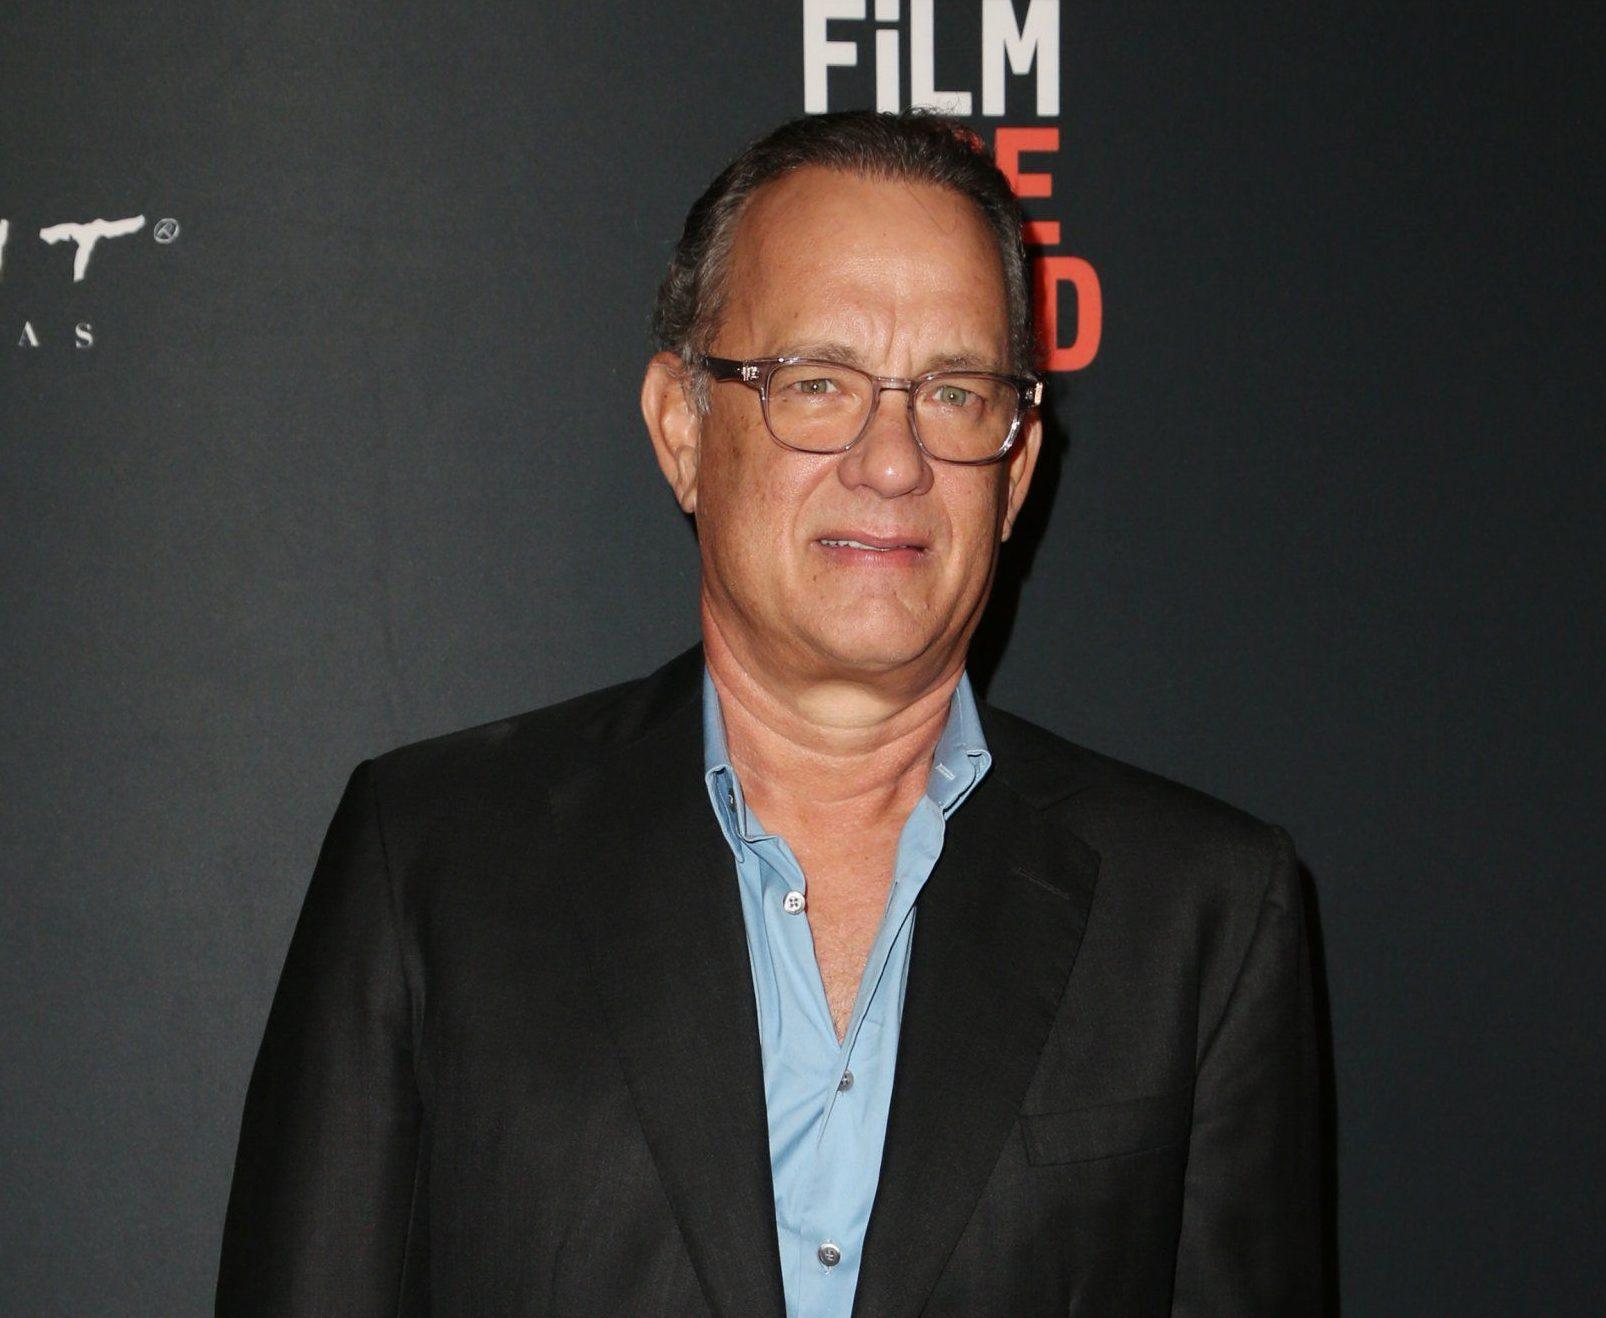 Mandatory Credit: Photo by MediaPunch/REX (9889479bw) Tom Hanks 'Simple Wedding' film premiere, Los Angeles Film Festival, USA - 21 Sep 2018